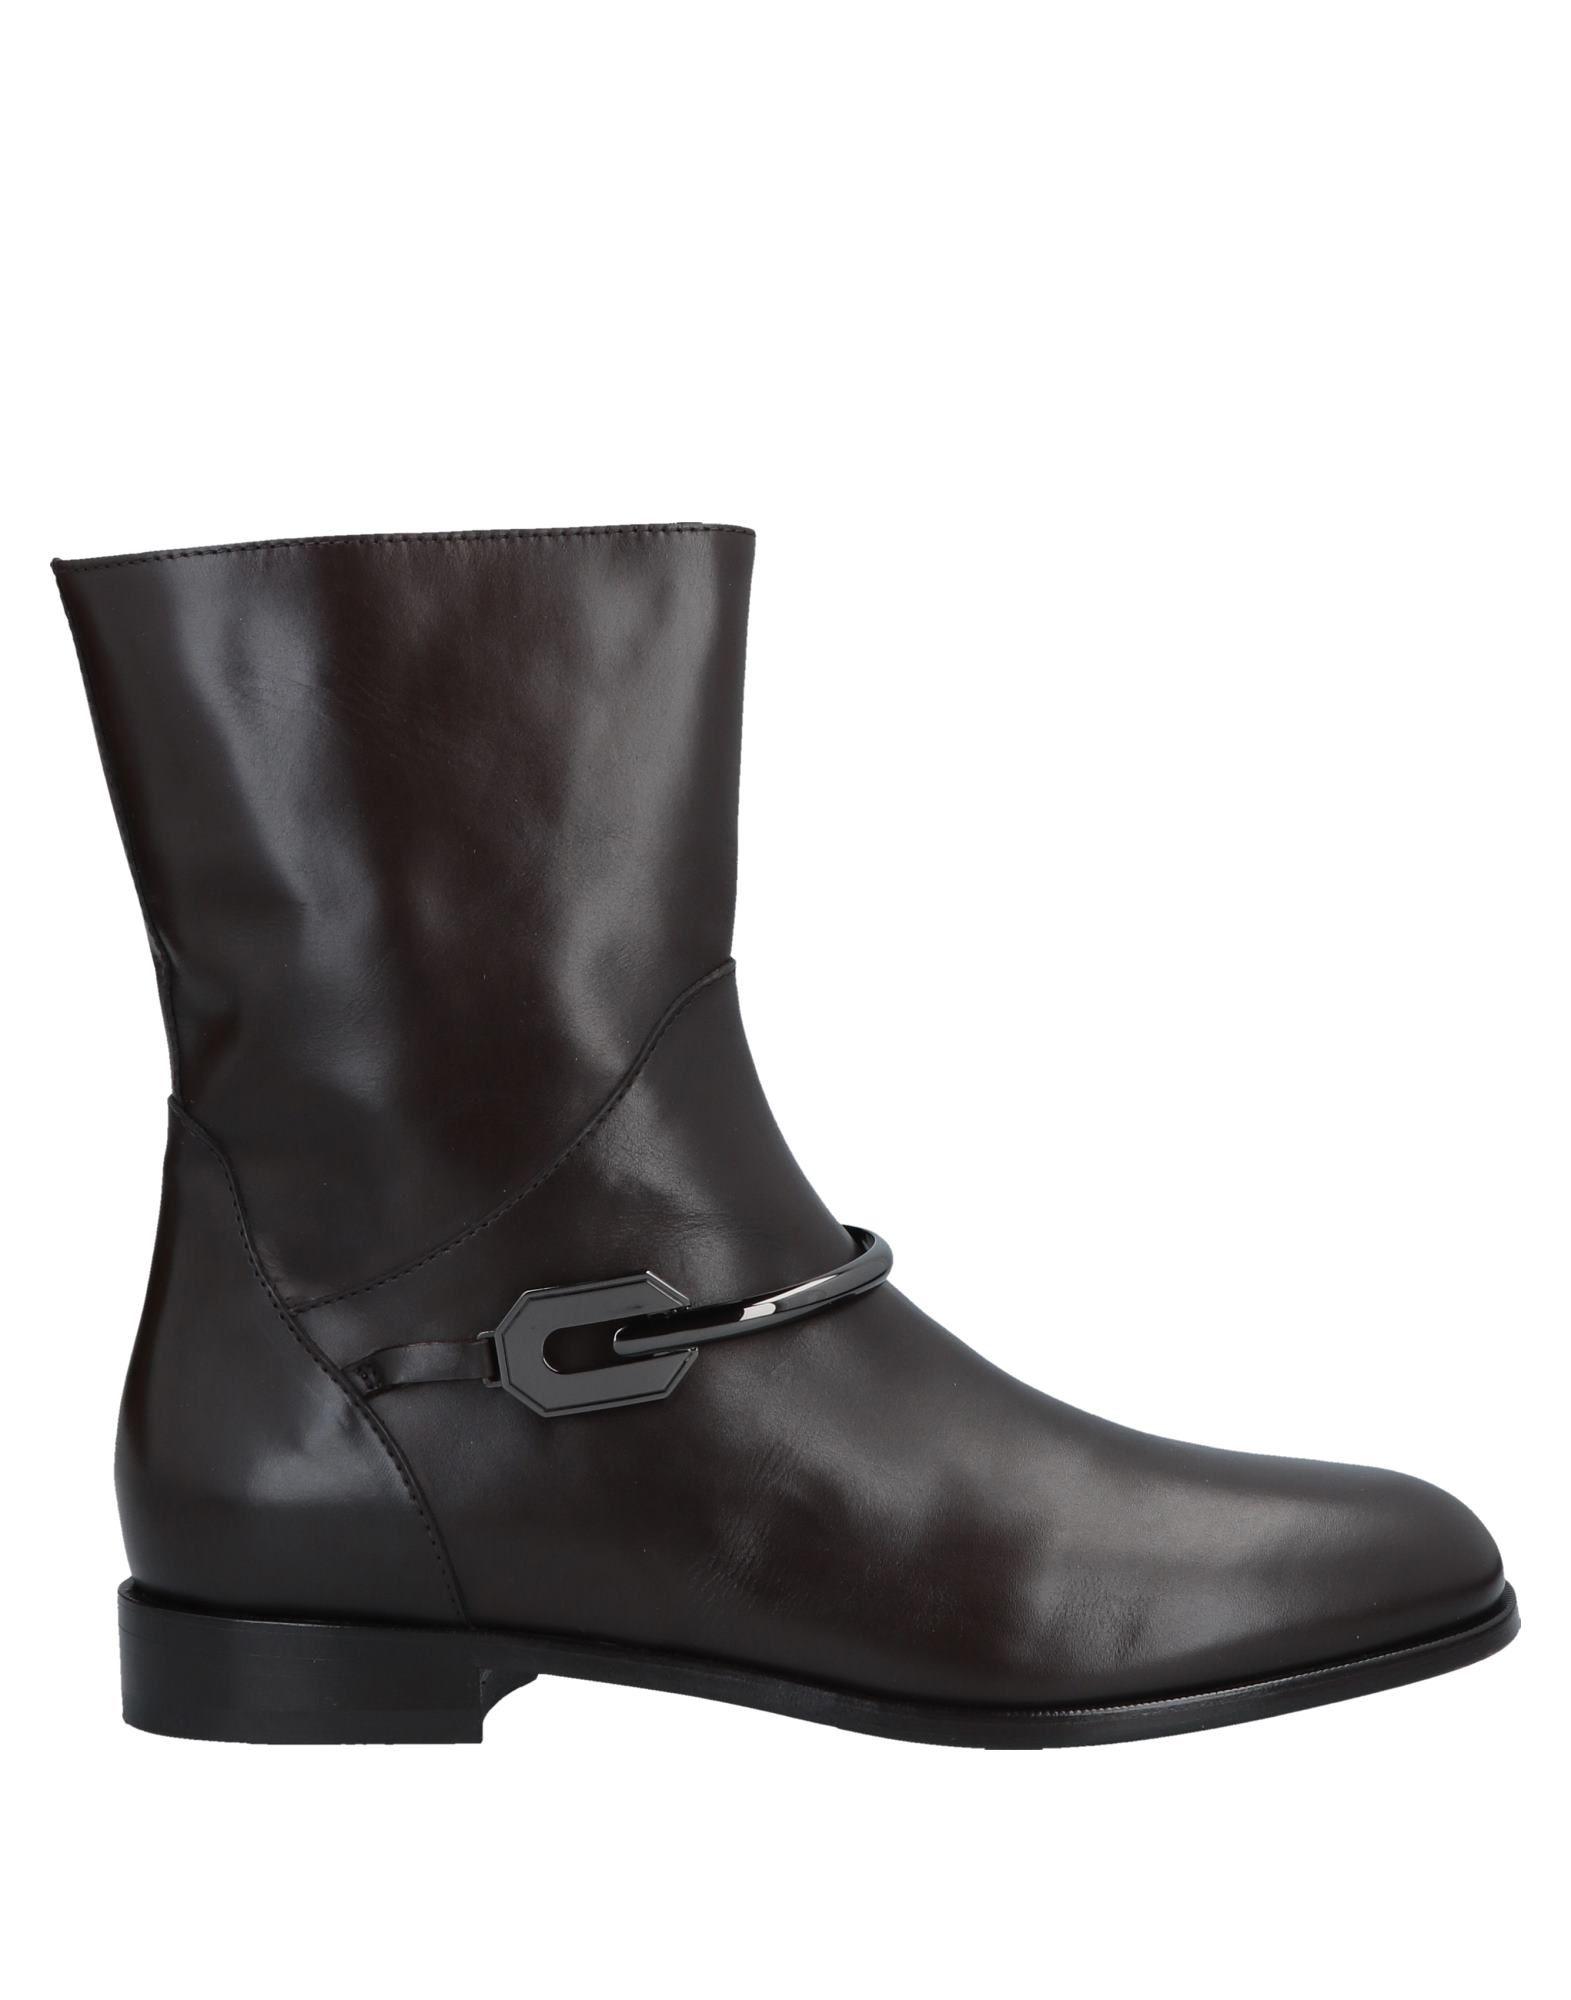 MAGLI by BRUNO MAGLI Полусапоги и высокие ботинки bruno magli полусапоги и высокие ботинки